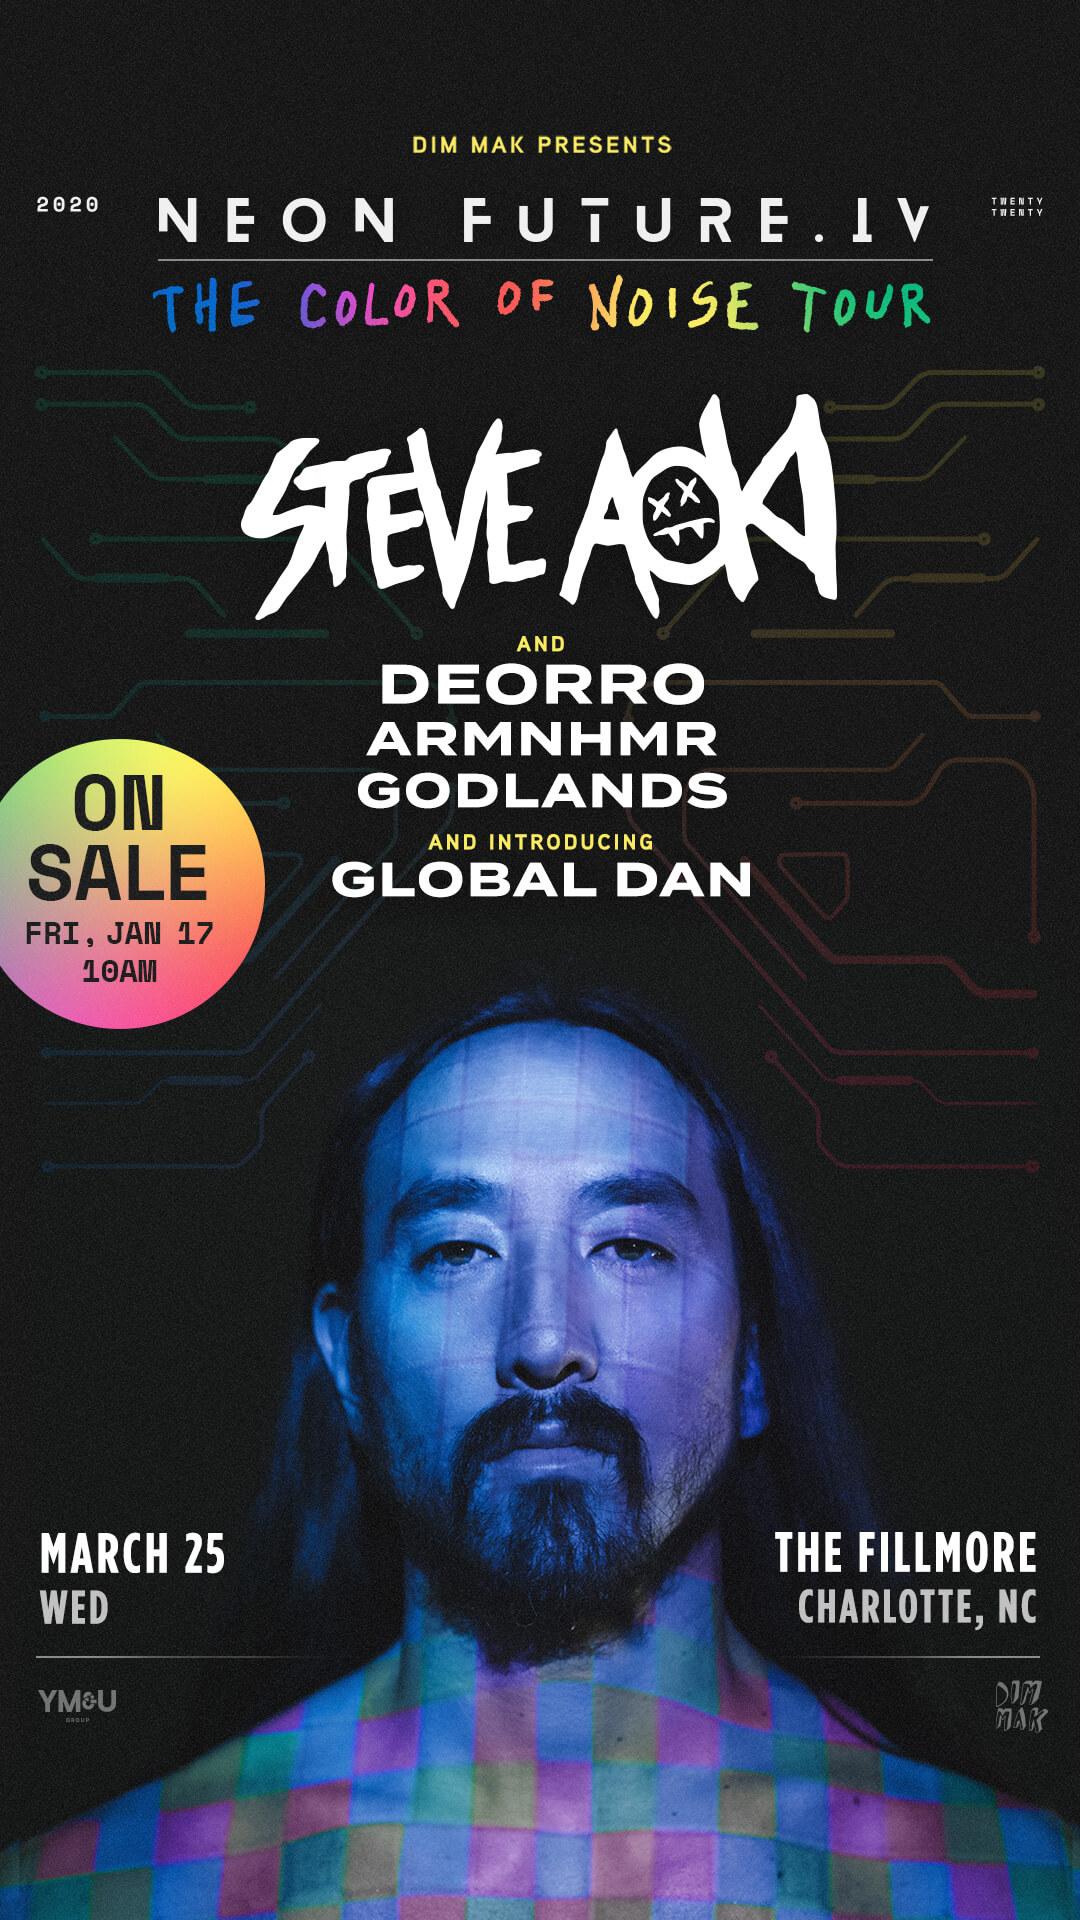 Steve Aoki, Deorro, ARMNHMR, Godlands, Global Dan in Charlotte